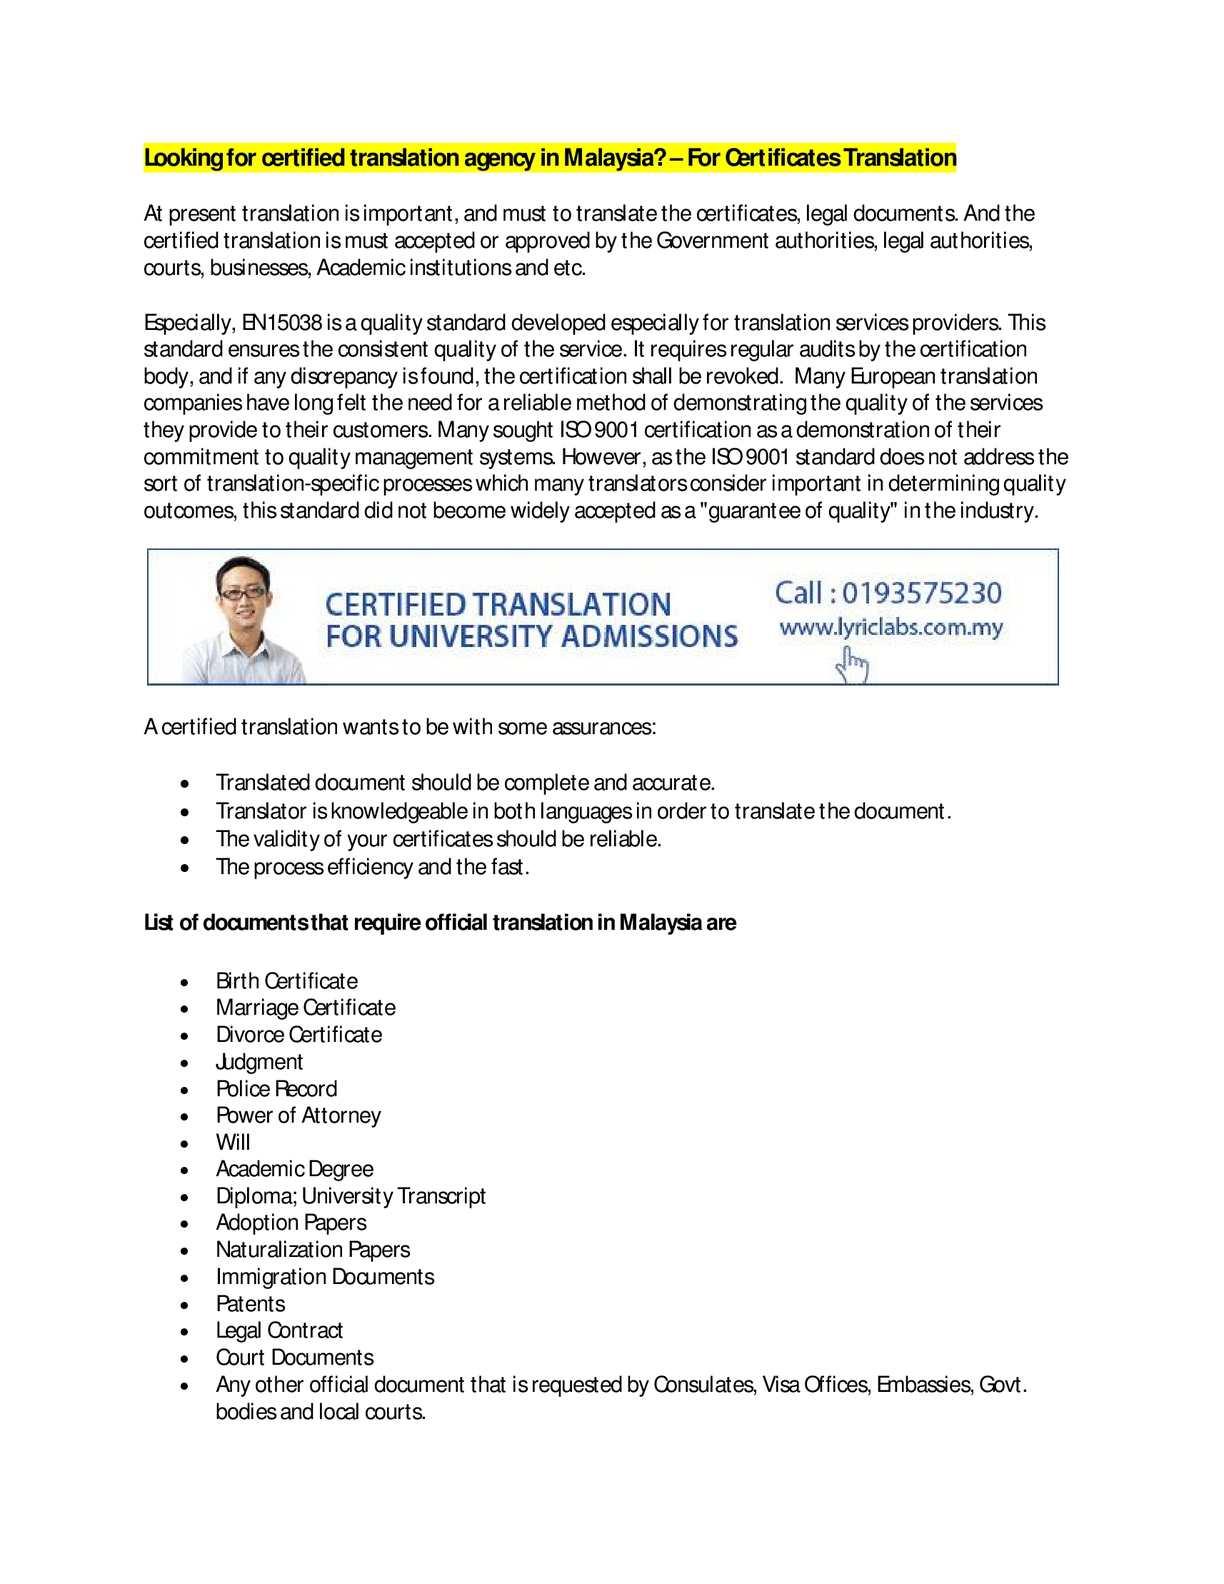 Calamo looking for certified translation agency in malaysia calamo looking for certified translation agency in malaysia for certificates translation aiddatafo Choice Image